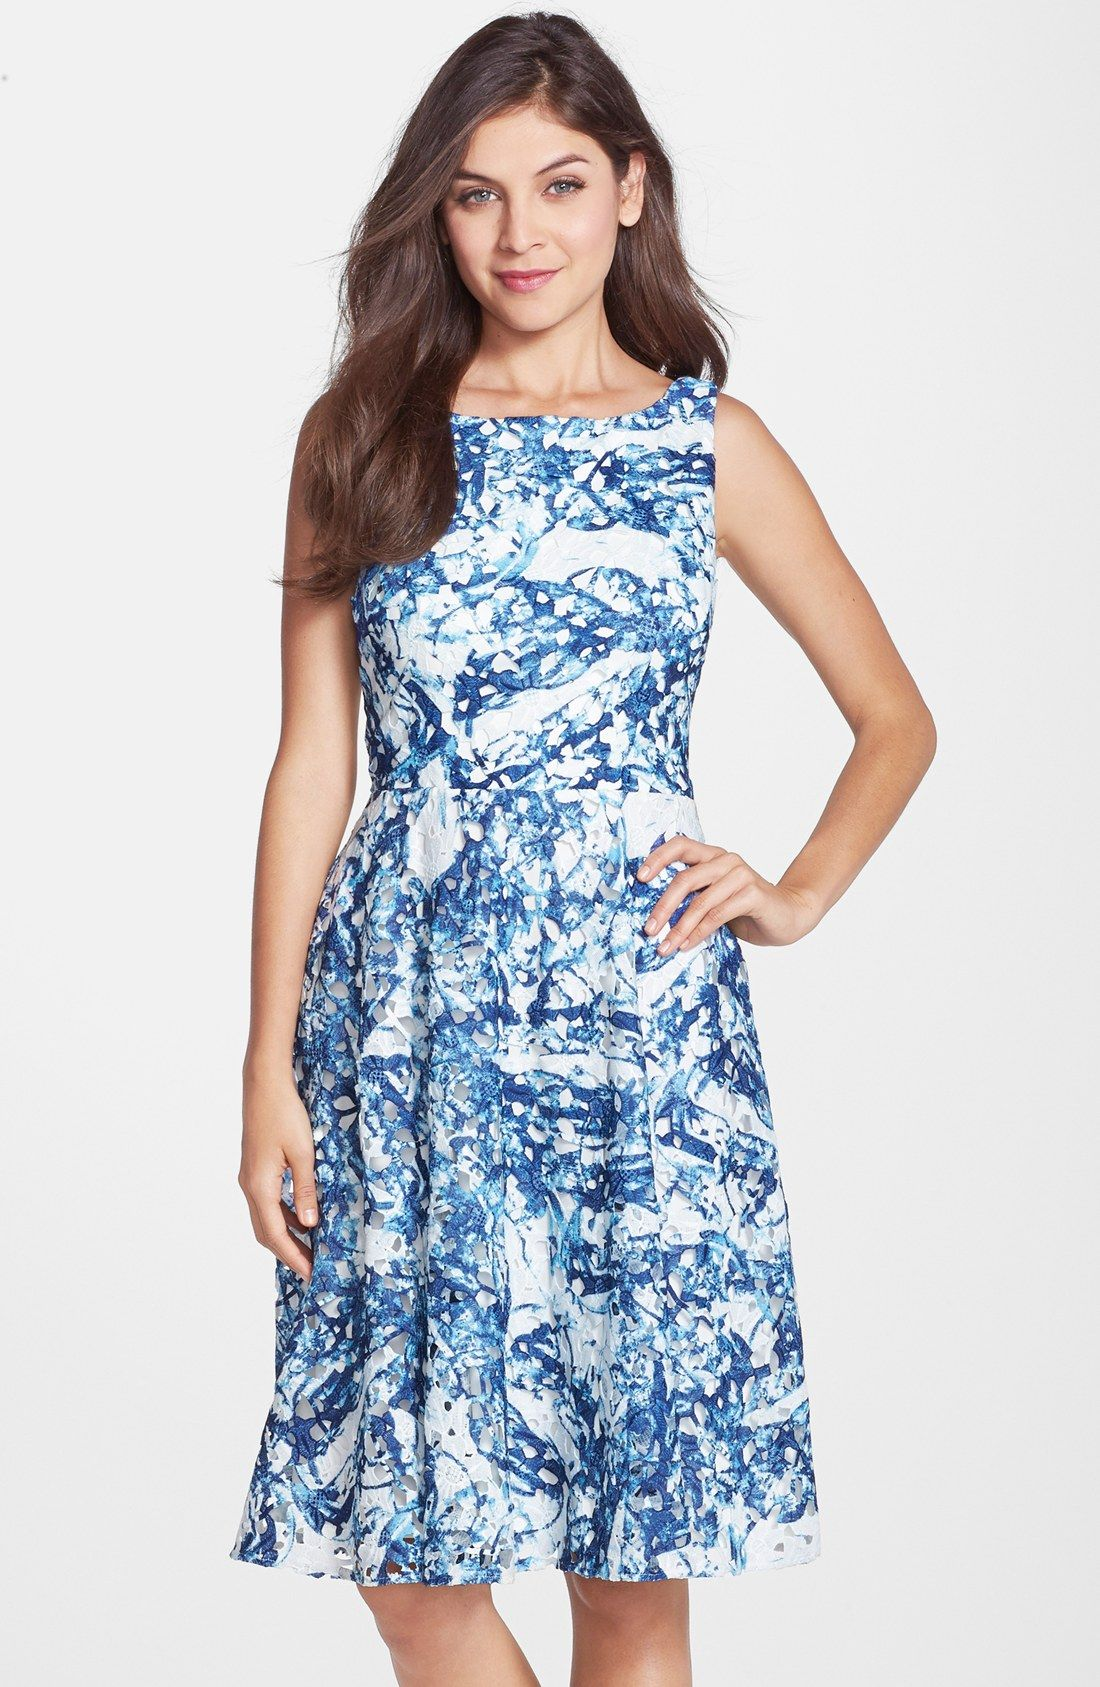 Comfortable Vera Wang Bridal Gowns 2014 Ideas - Wedding Ideas ...